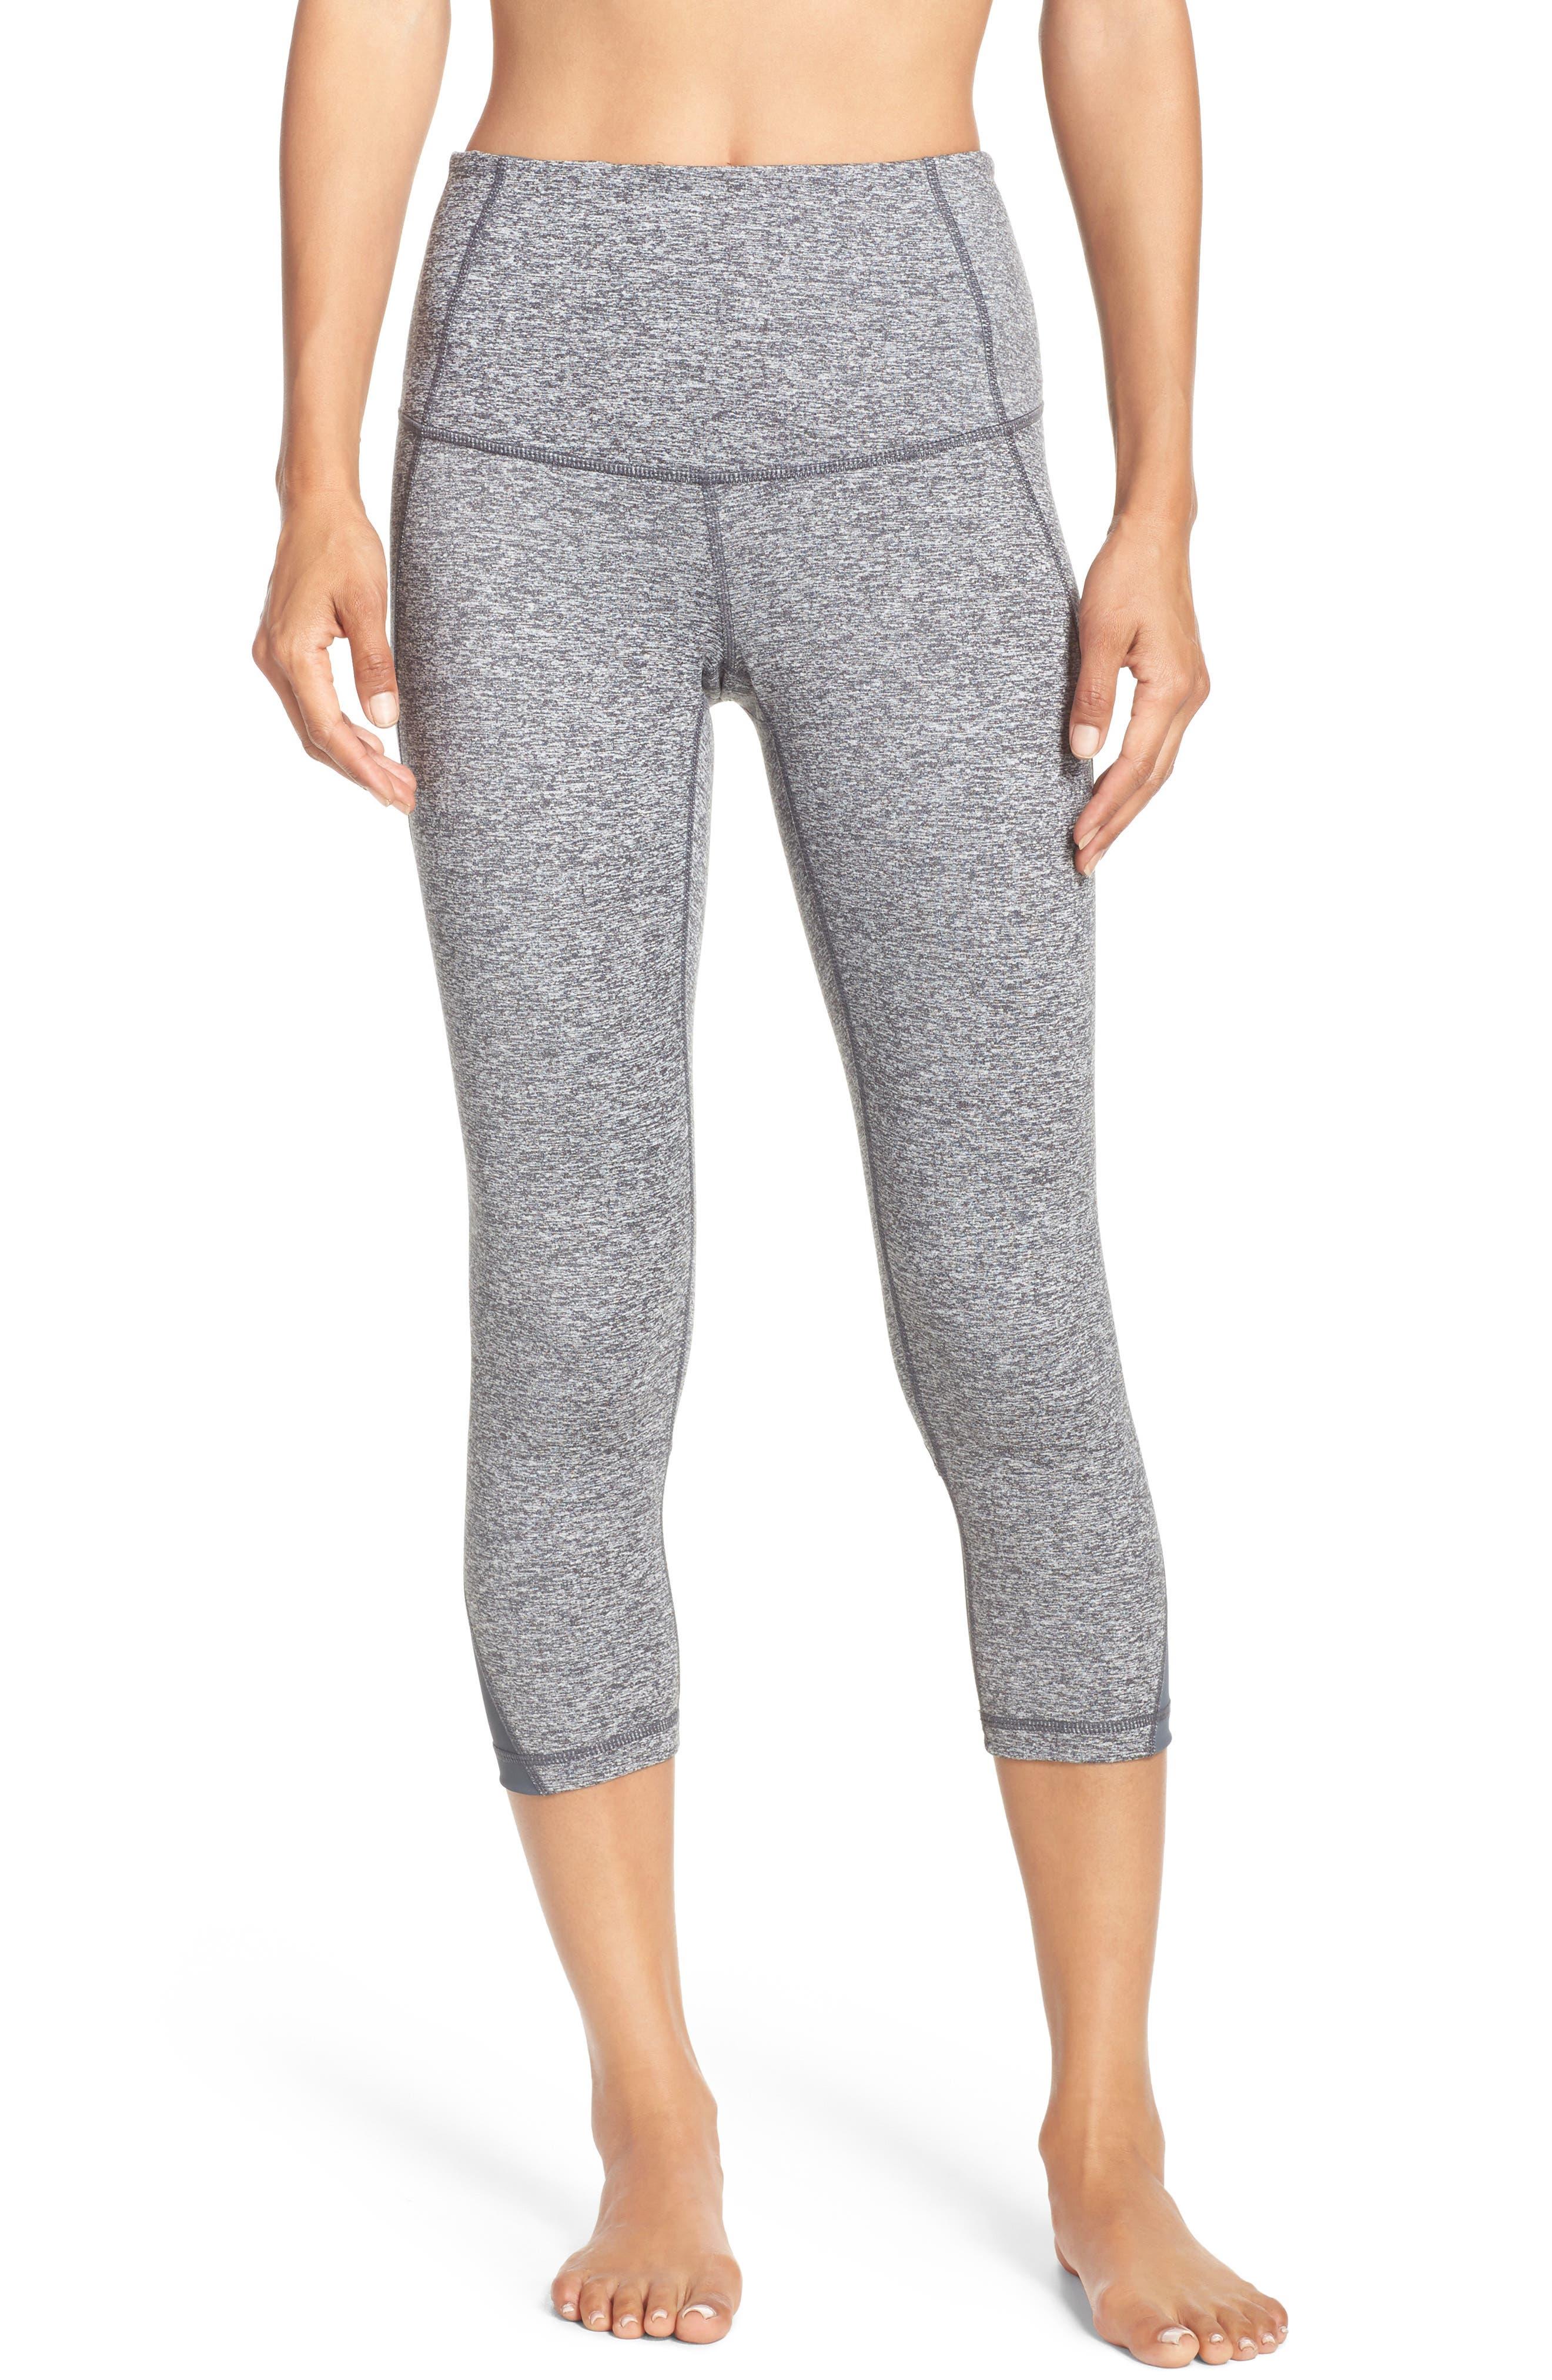 'Hatha' High Waist Crop Leggings,                         Main,                         color, Grey Graphite Melange